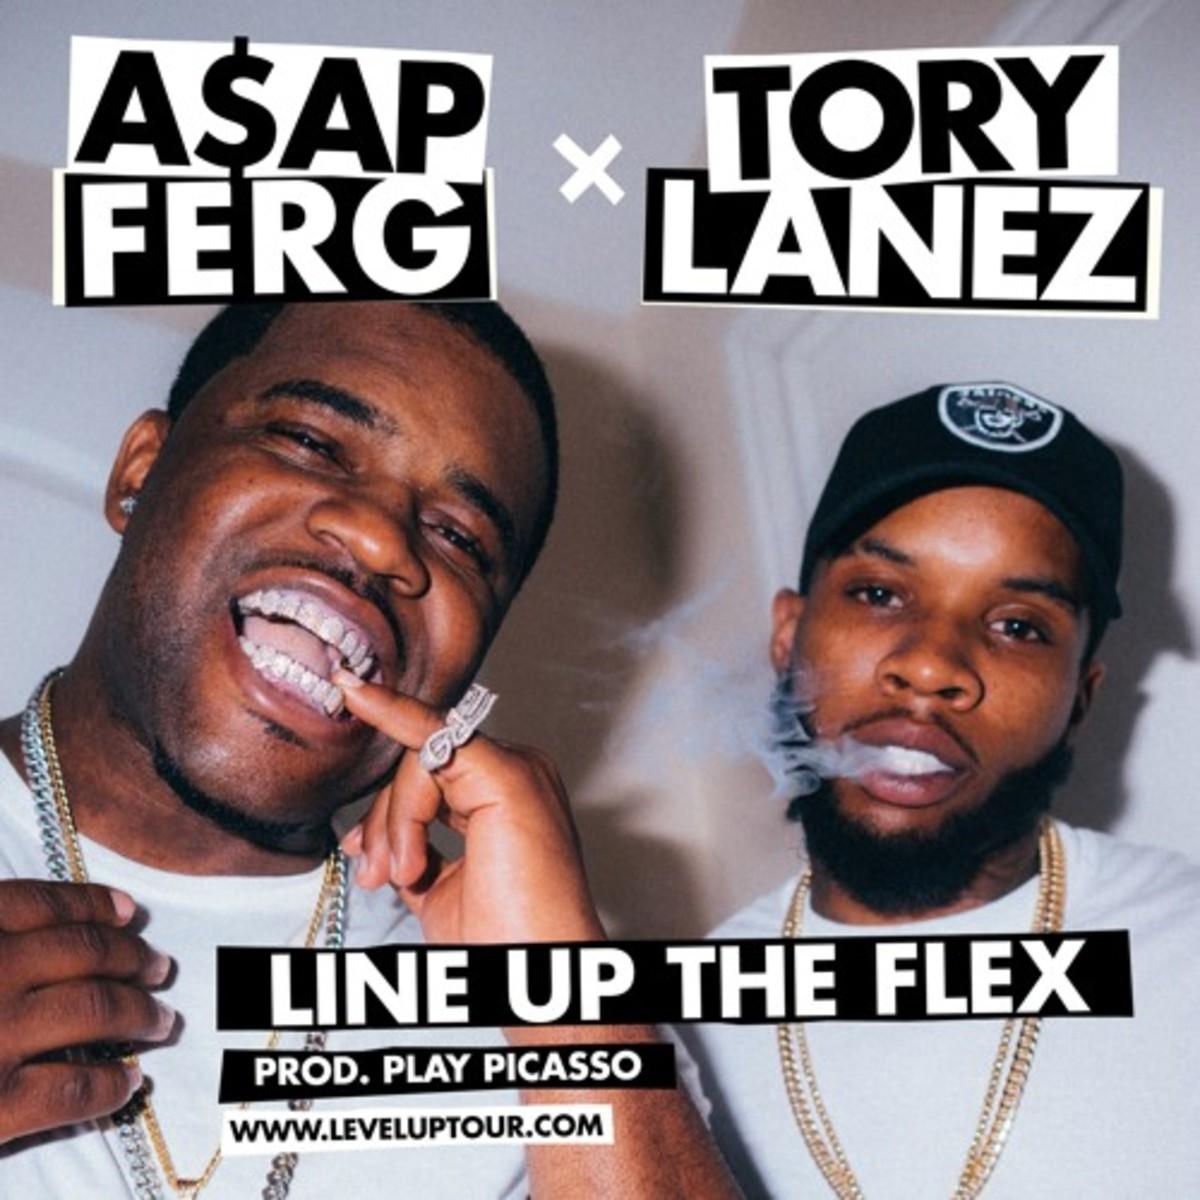 asap-ferg-tory-lanez-line-up-the-flex.jpg